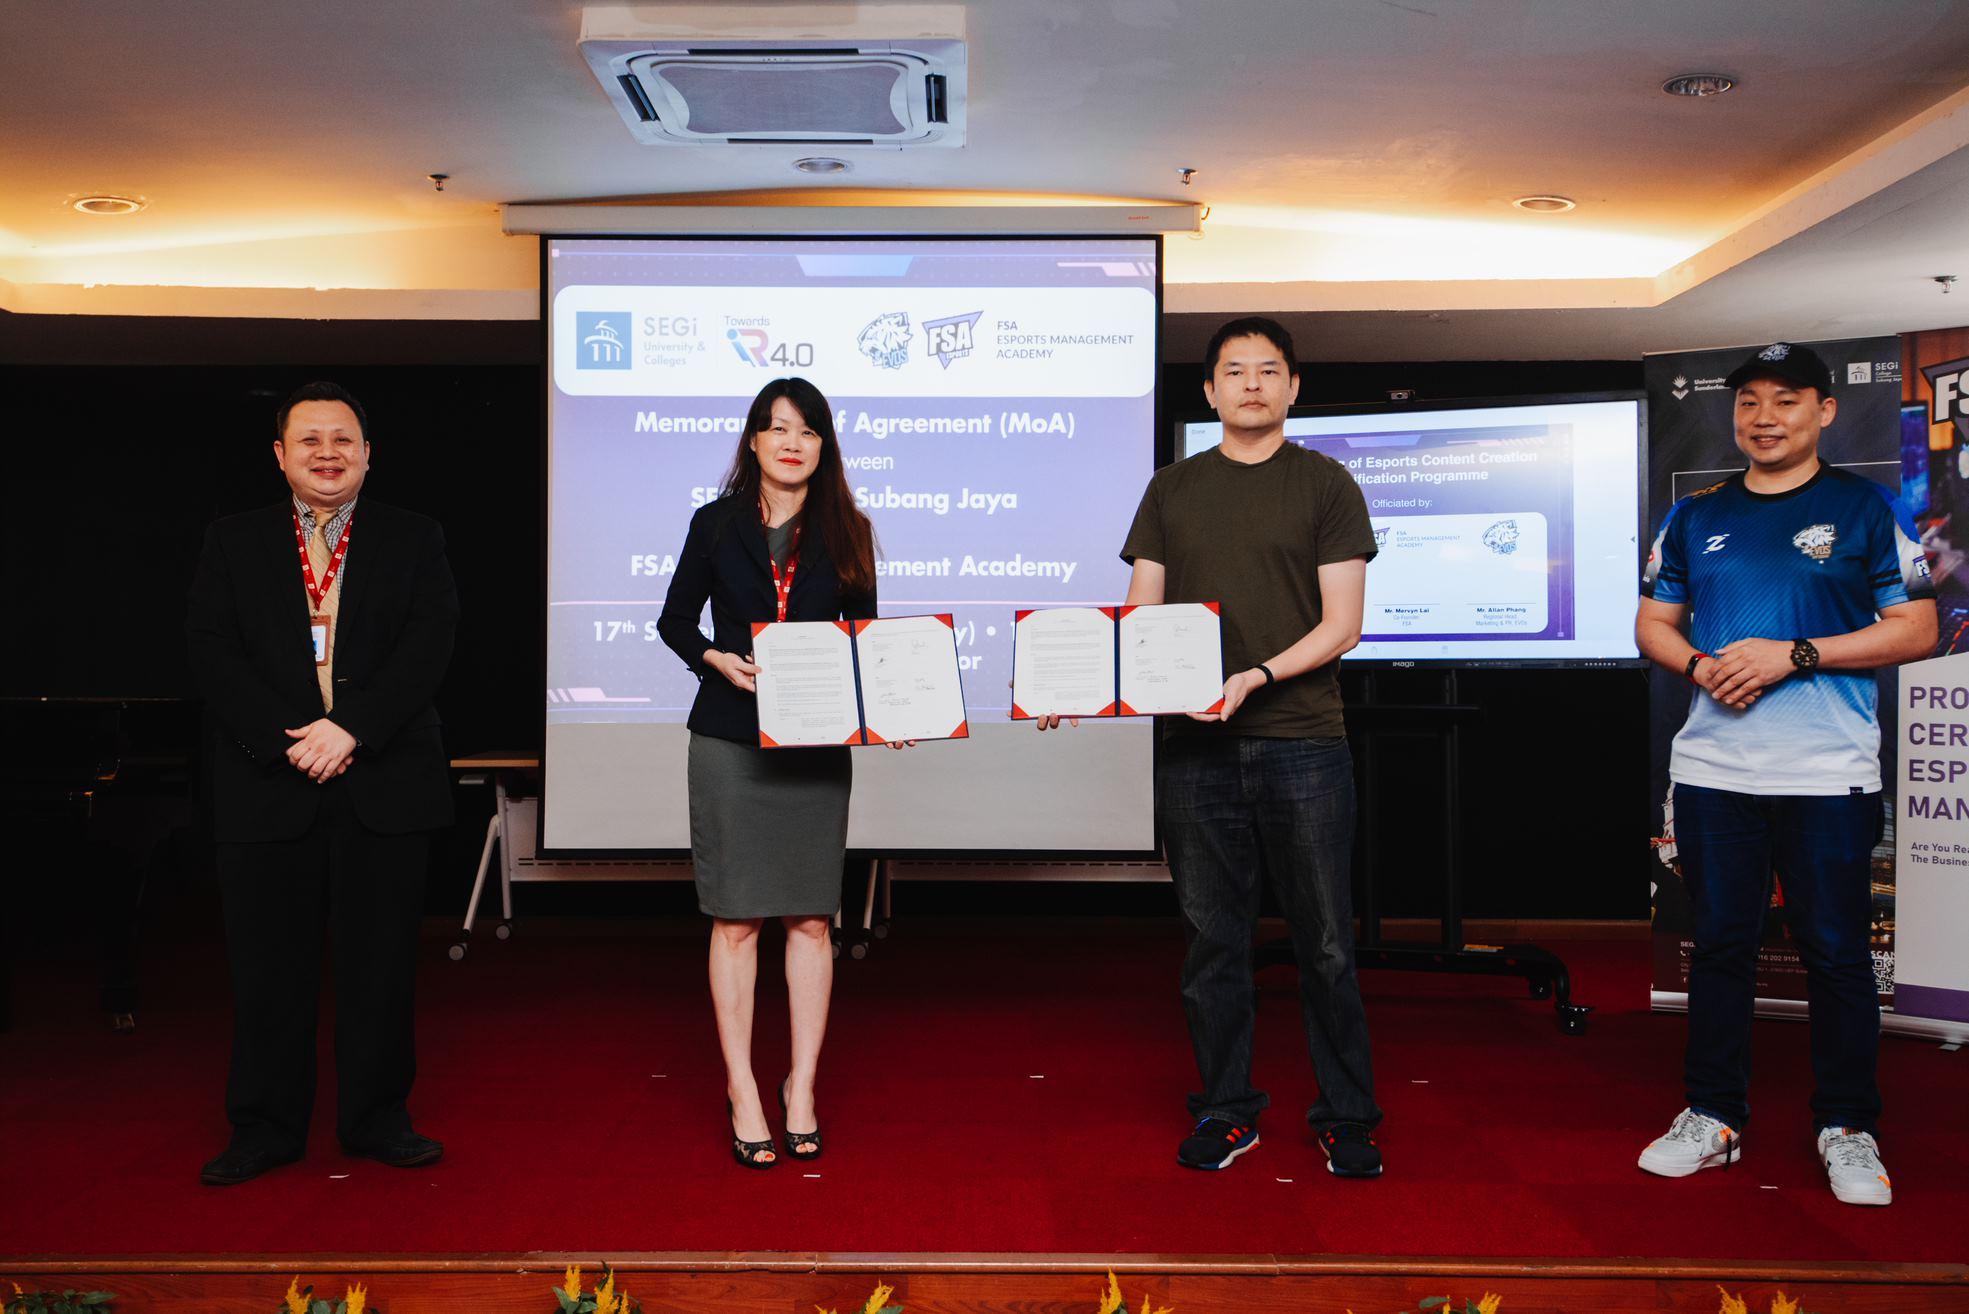 SEGi College, FSA dan EVOS Esports tandatangani memorandum perjanjian